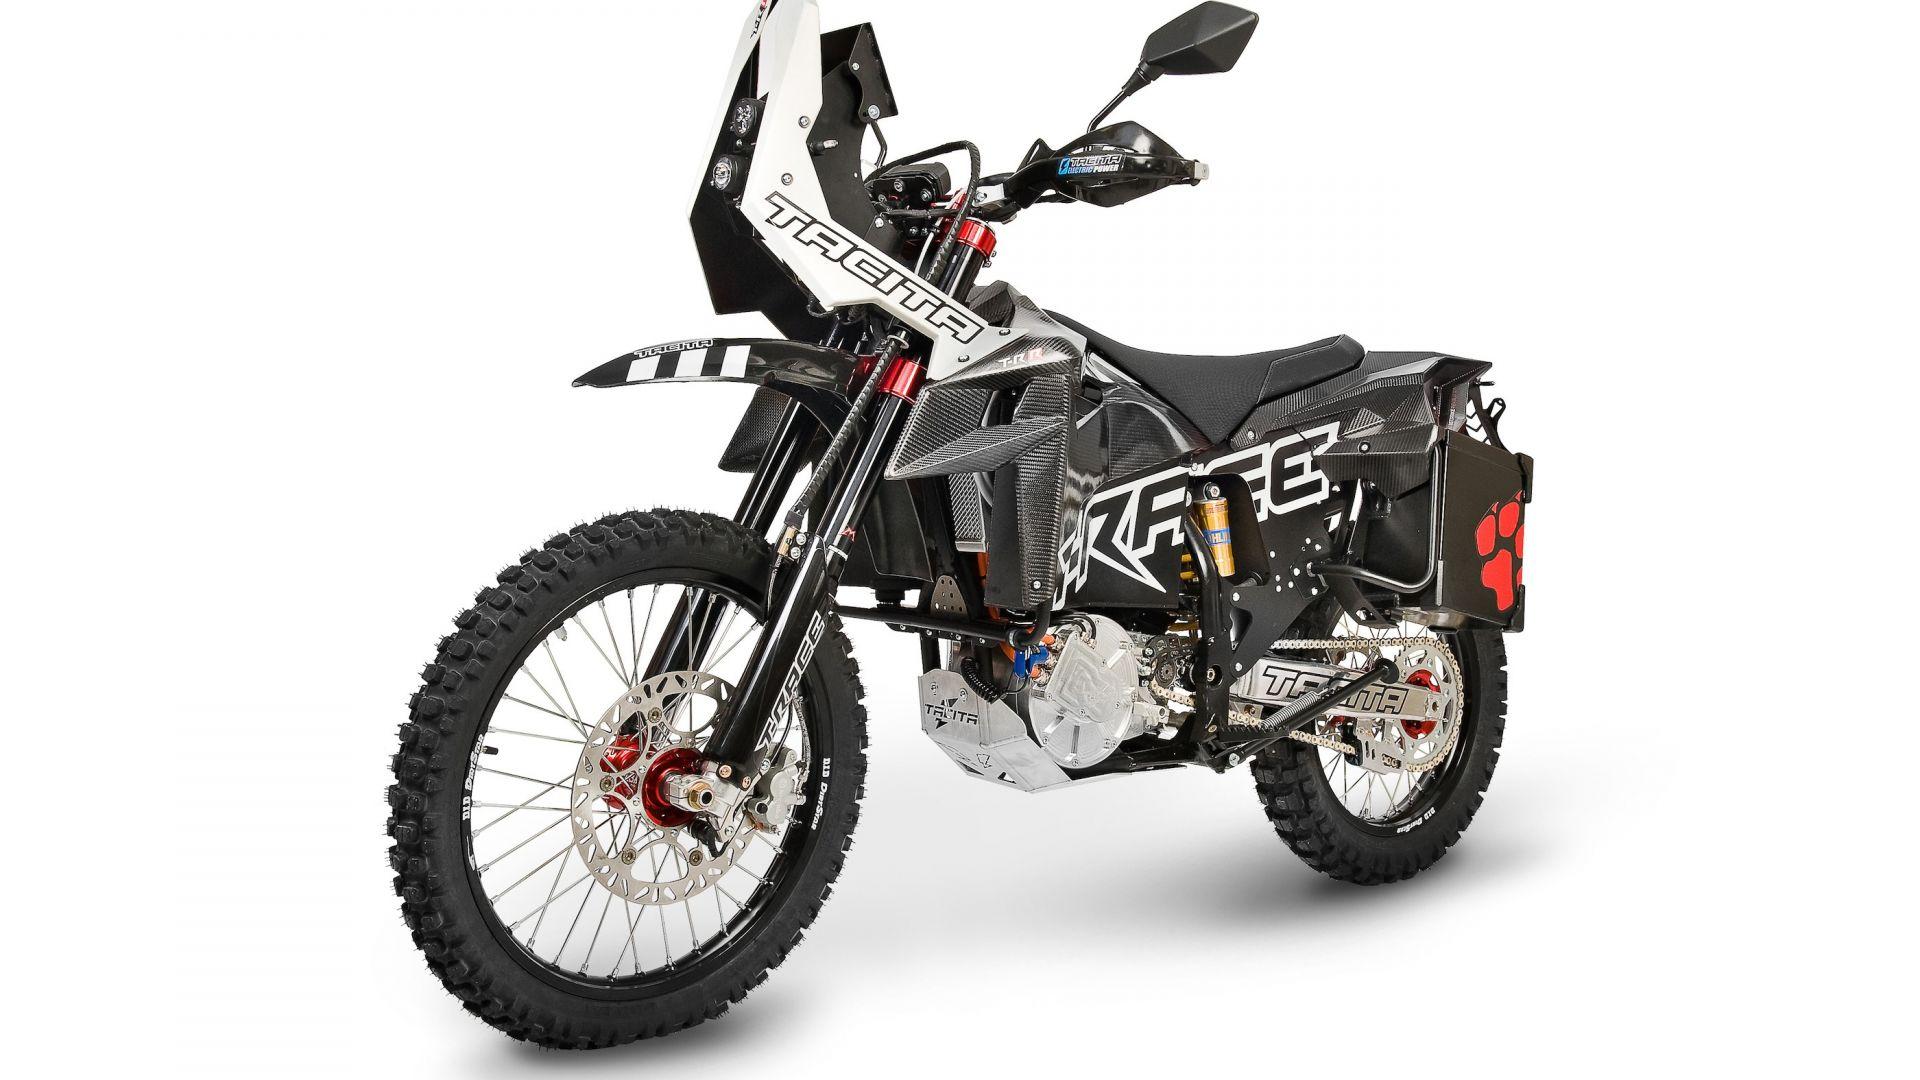 novit moto tacita t rally 2016 motorbox. Black Bedroom Furniture Sets. Home Design Ideas